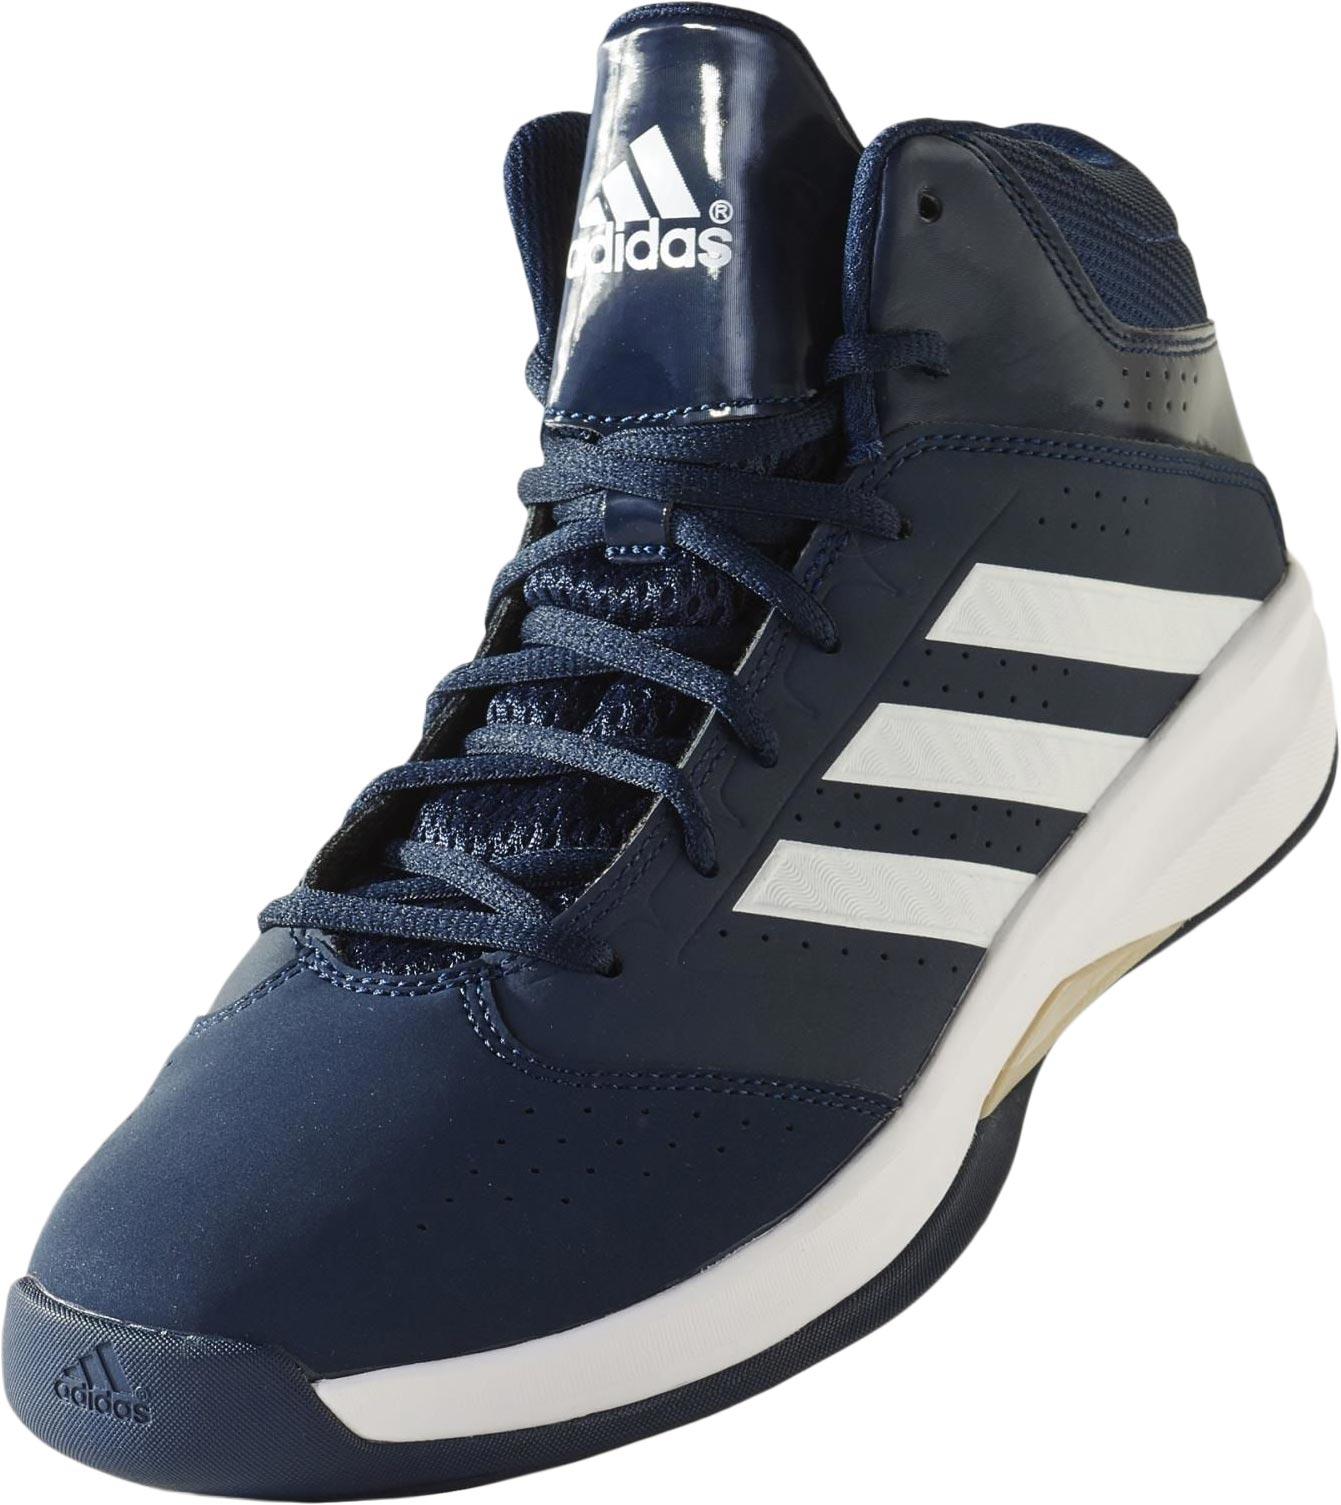 White Basketball Shoes Adidas